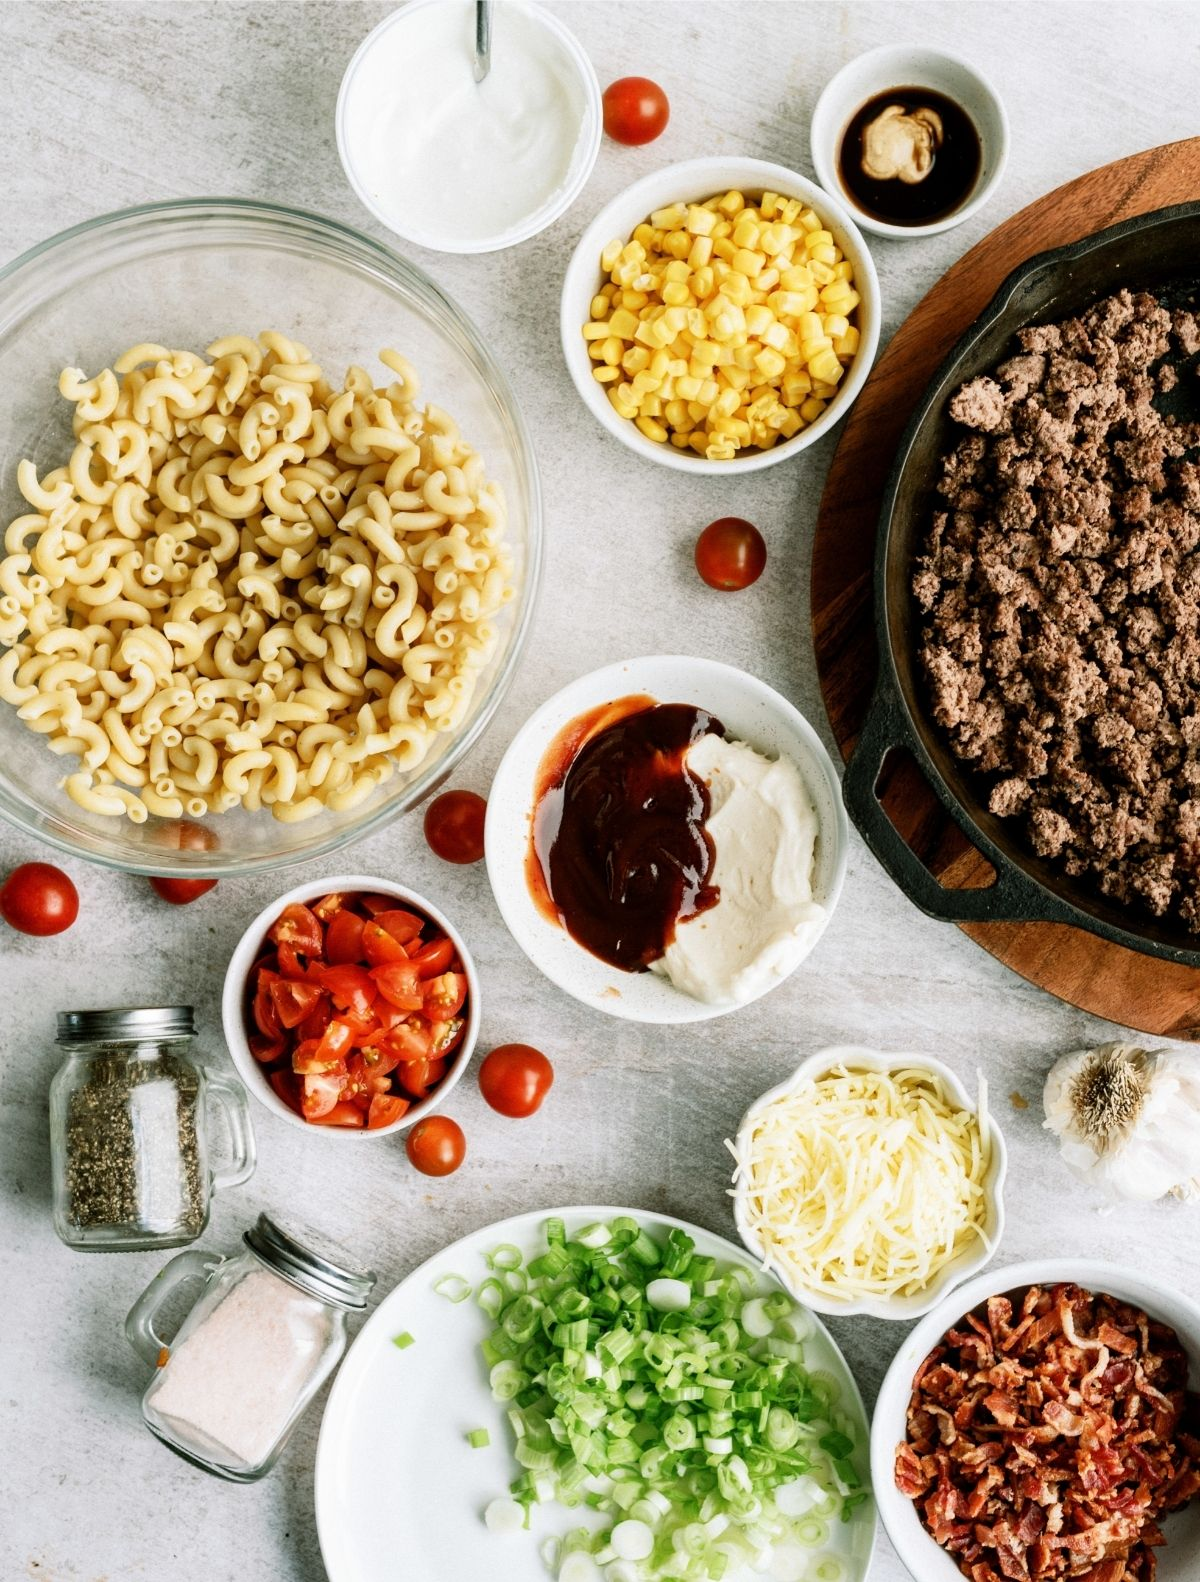 Ingredients for Cowboy Pasta Salad